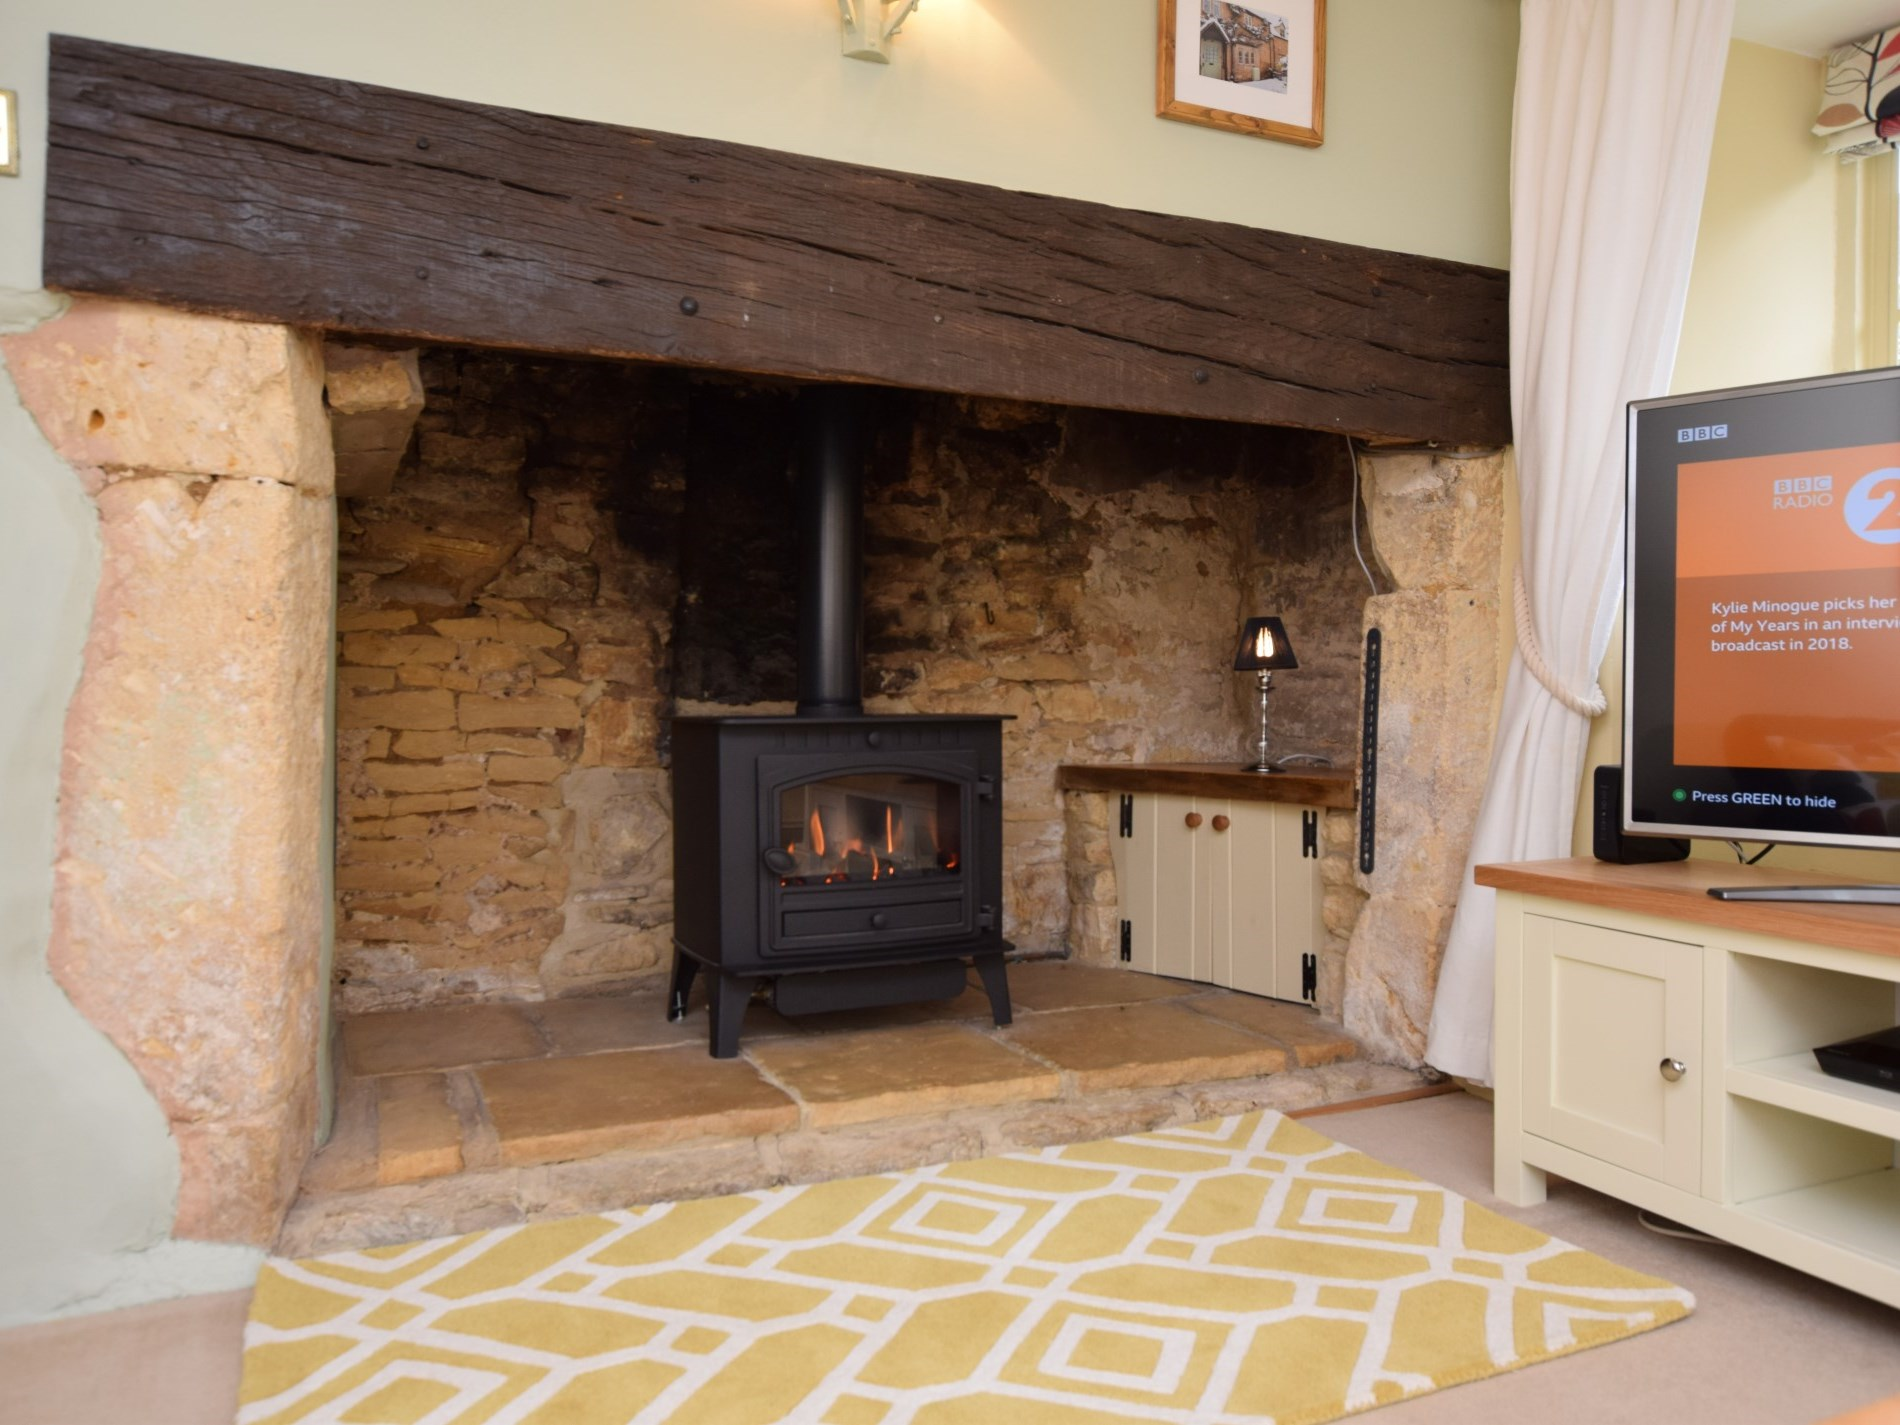 Inglenook fireplace with woodburner